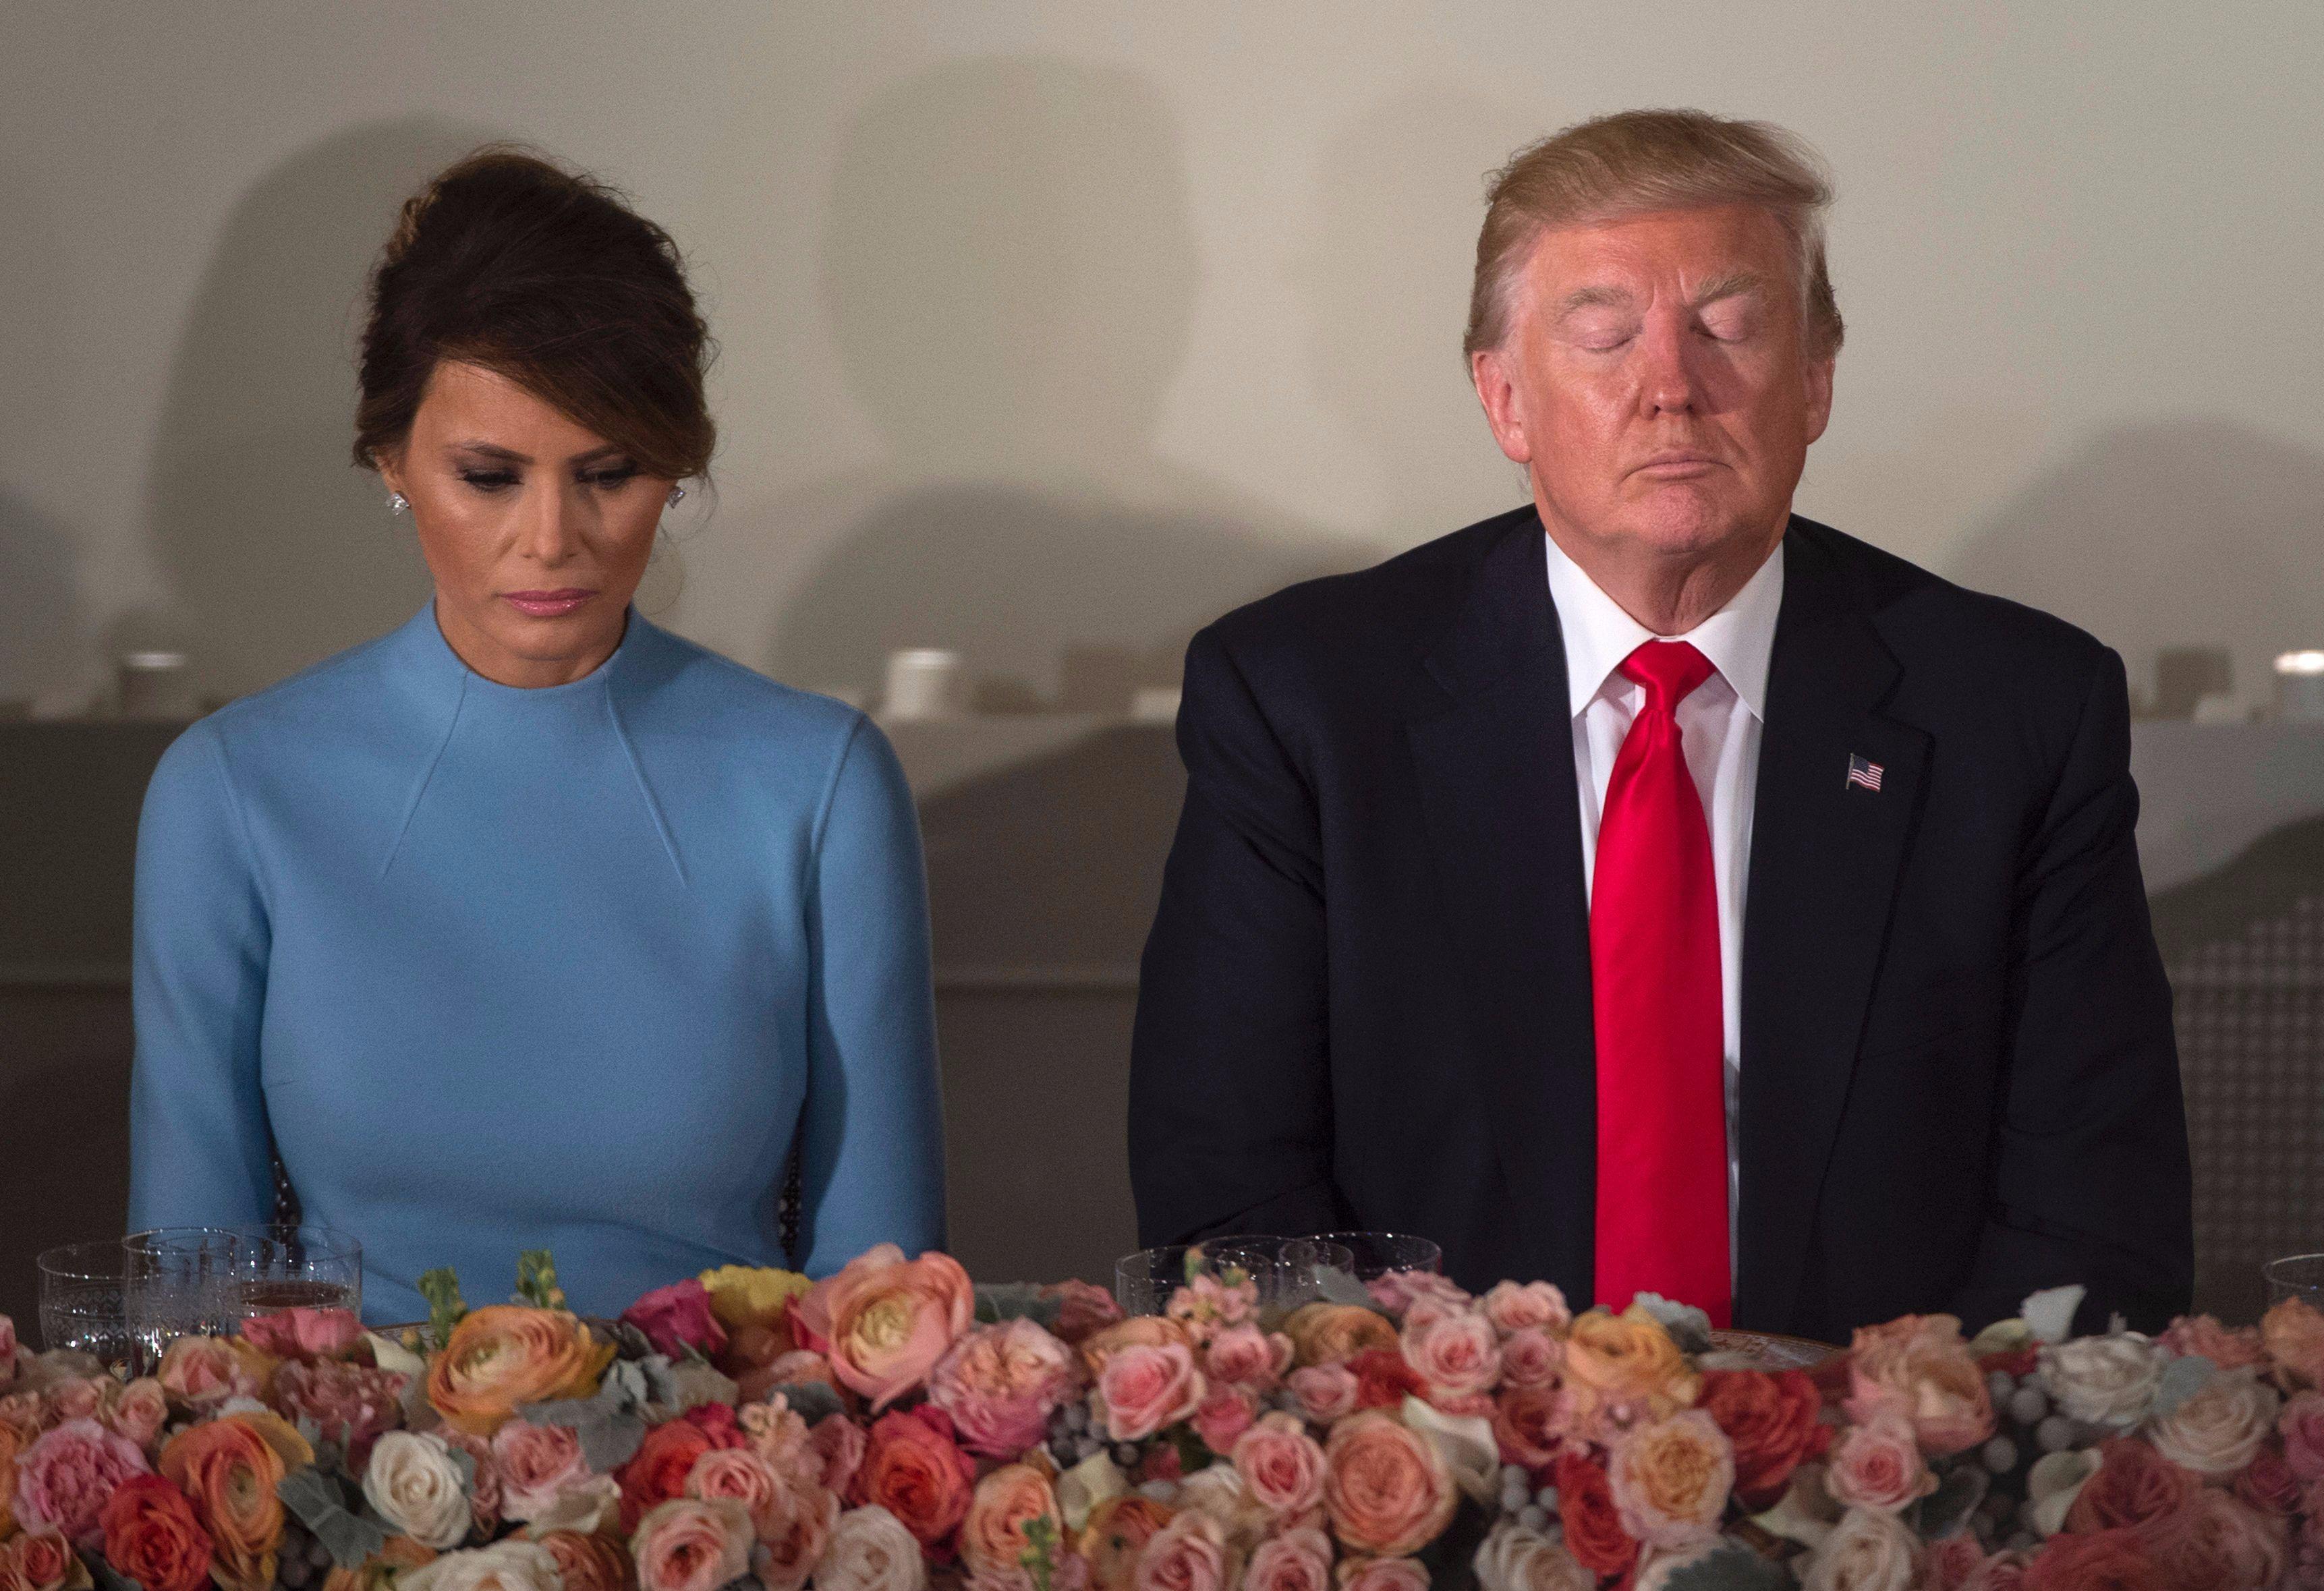 Nordstrom Drops Ivanka Trump's Fashion Line Amid Boycott